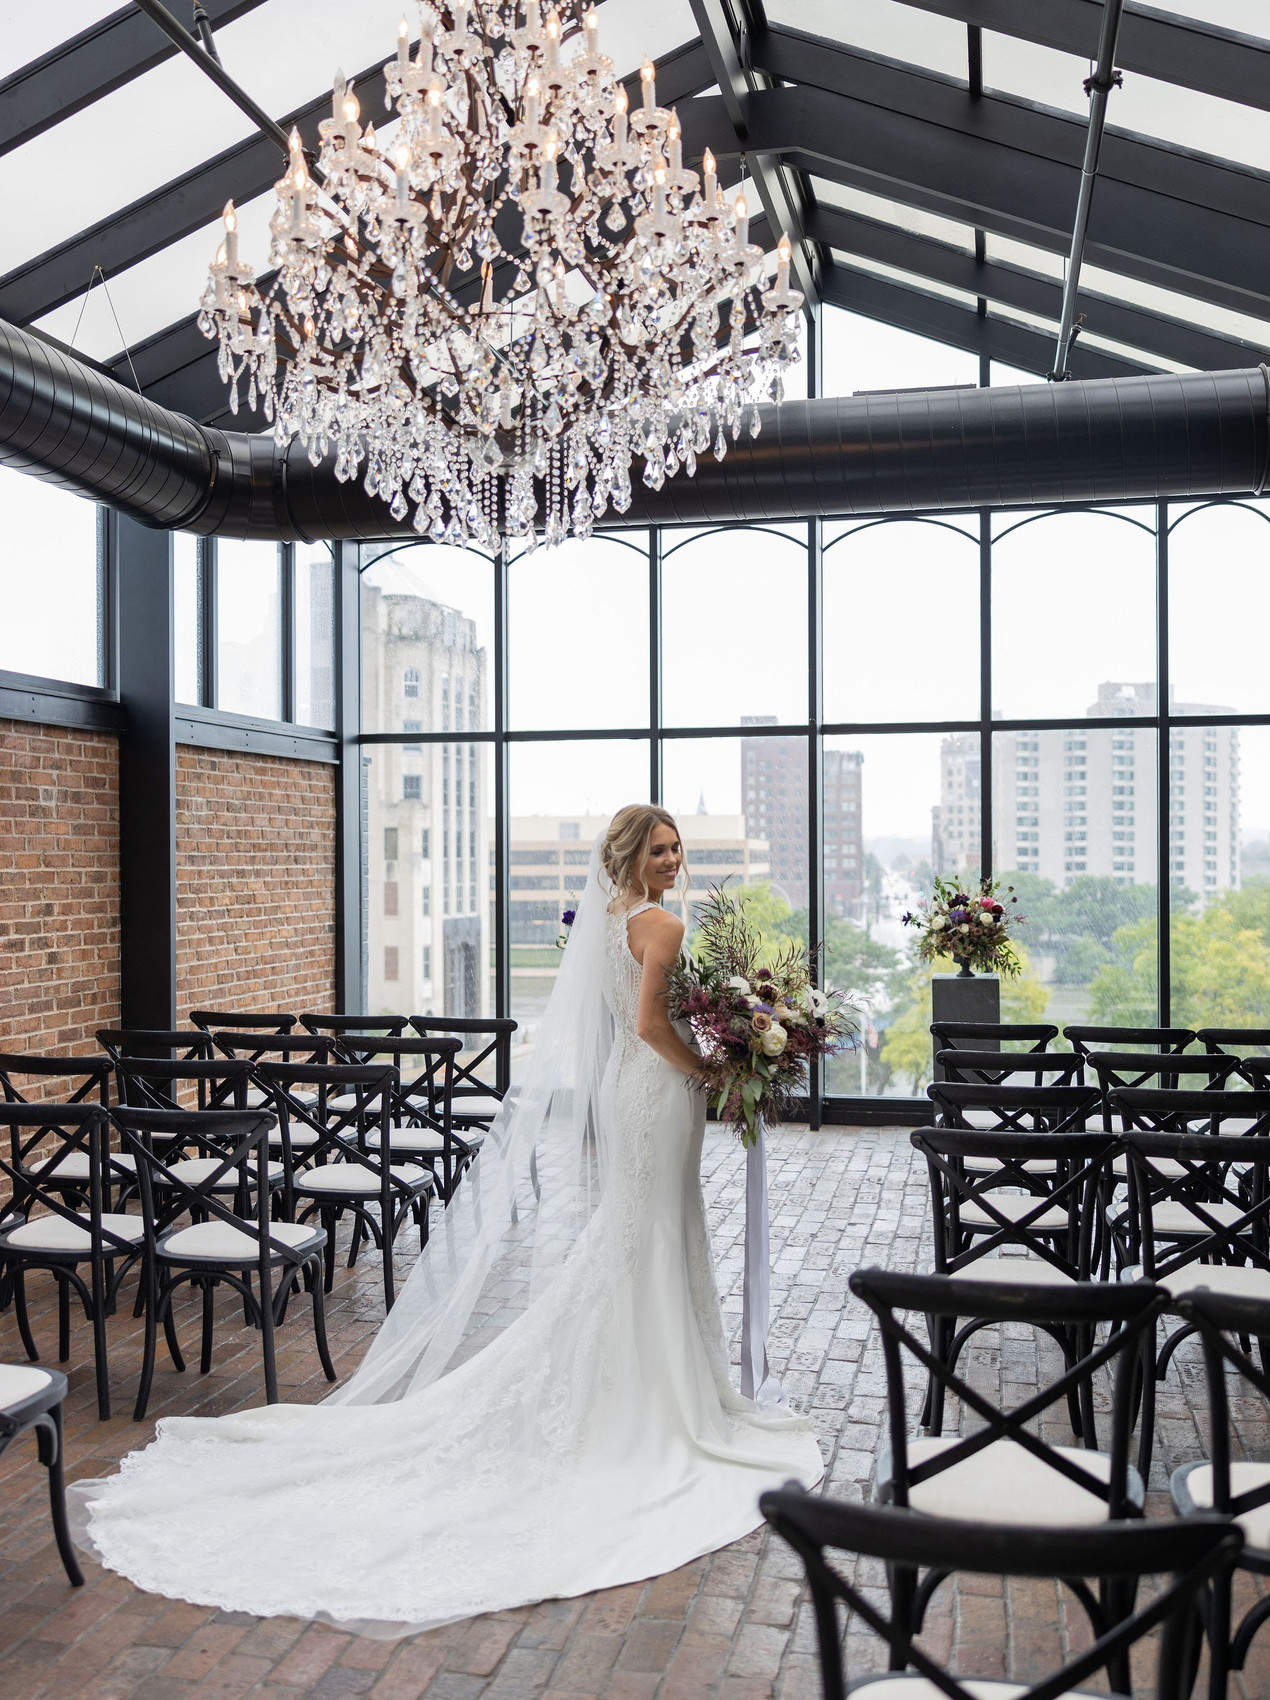 Rockford Illinois wedding ceremony